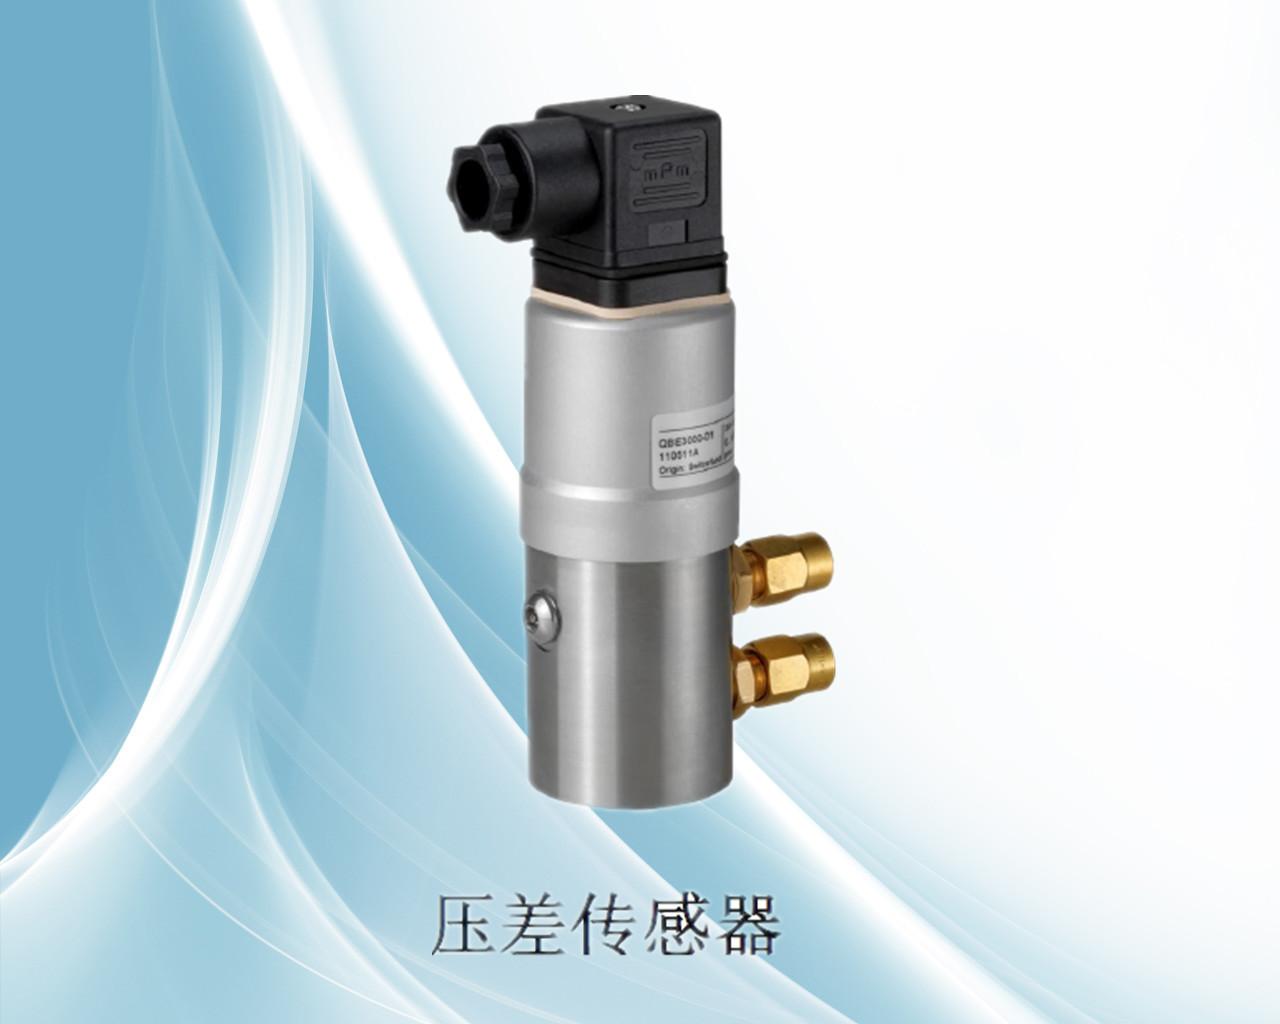 QBE3100-D4QBE9000 西门子水压差传感器、制冷剂压力变送器